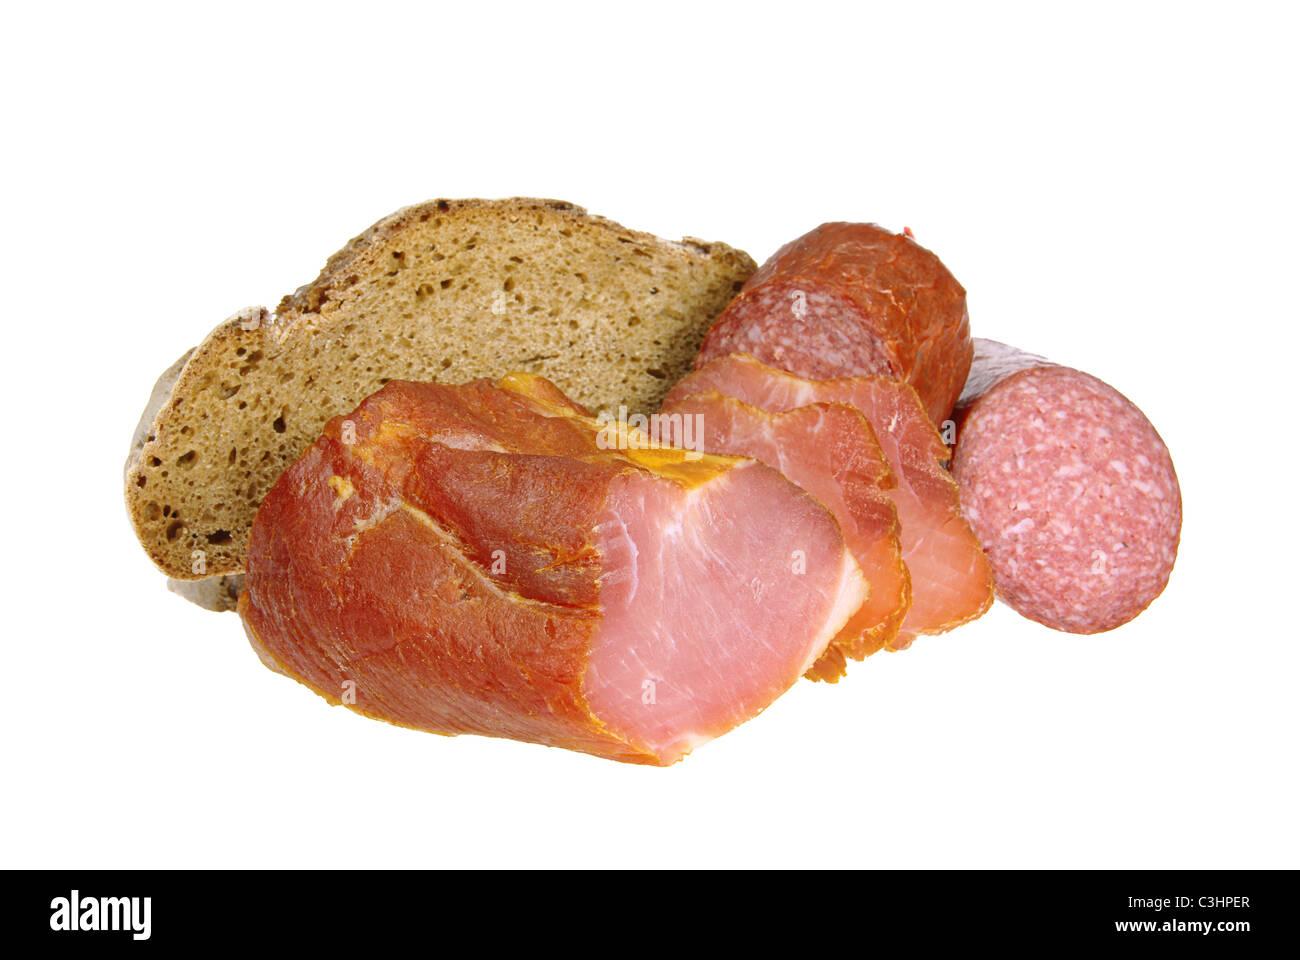 Schinken Brot Salami - ham bread salami 03 - Stock Image